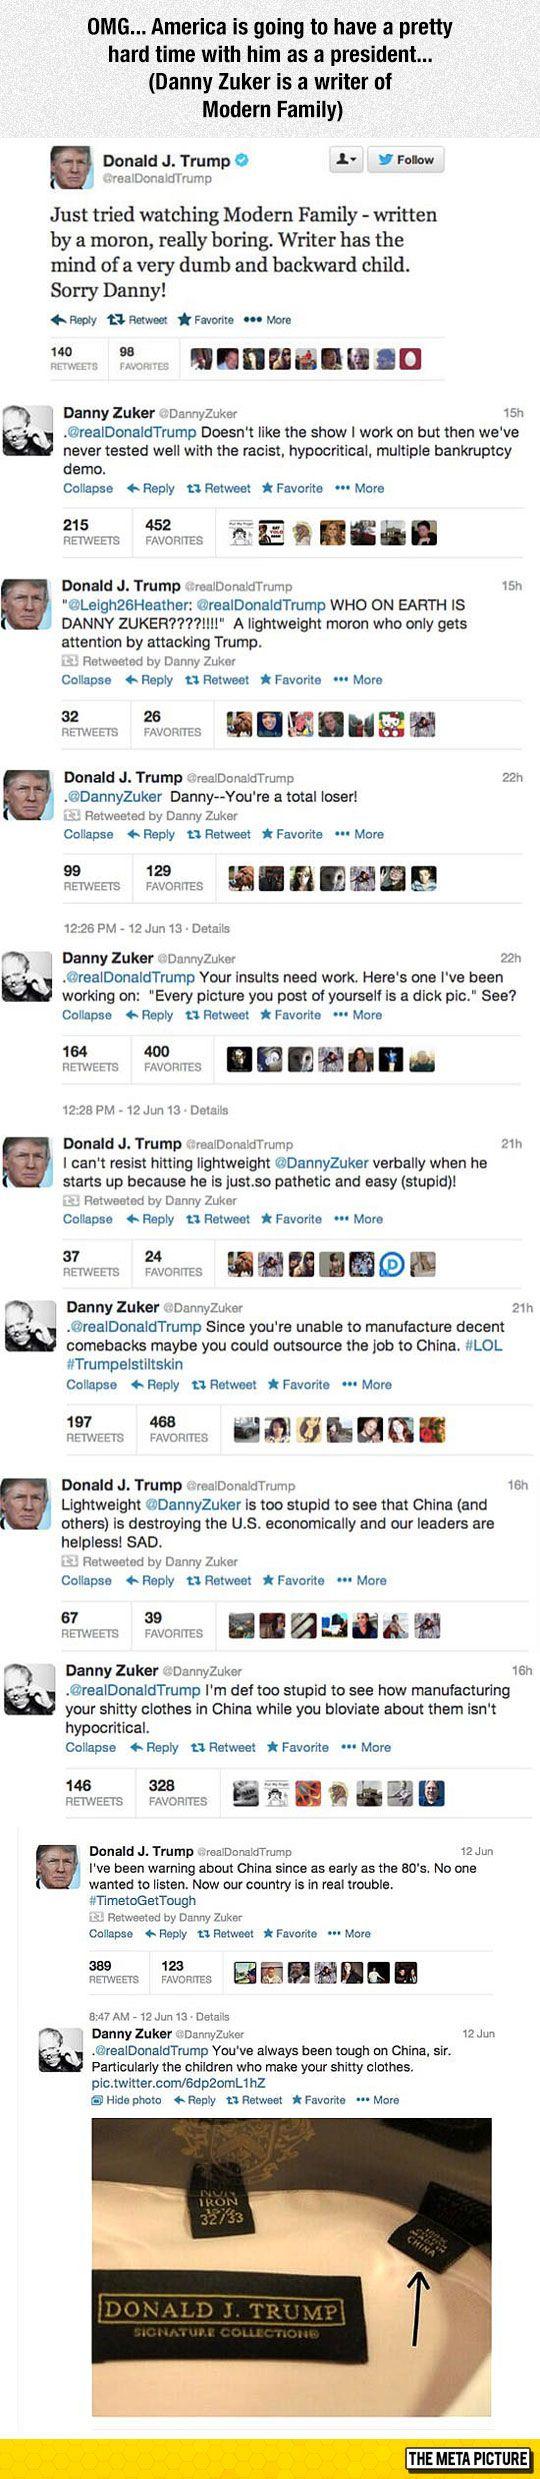 Donald Trump Vs. Modern Family Writer - BOOM GOES THE DYNAMITE.